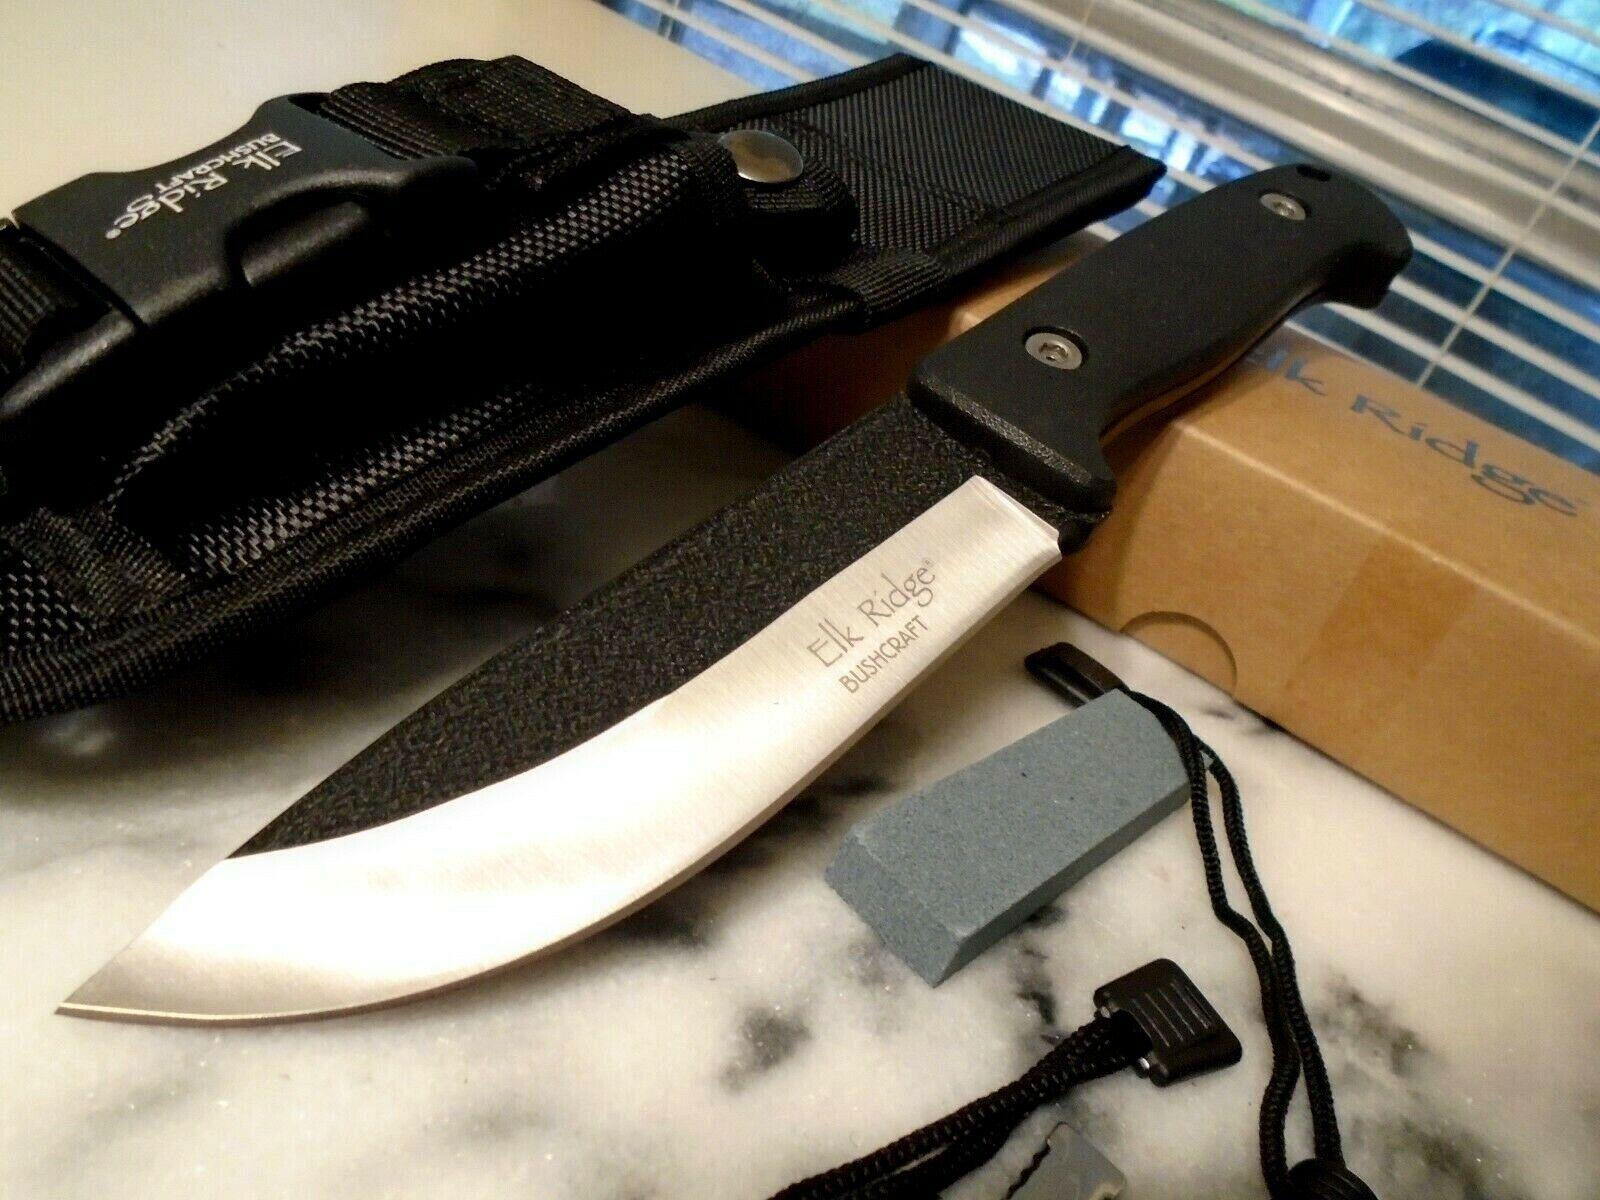 Elk Ridge Bushcraft Black Hunter Bowie Knife 5mm Full Tang F